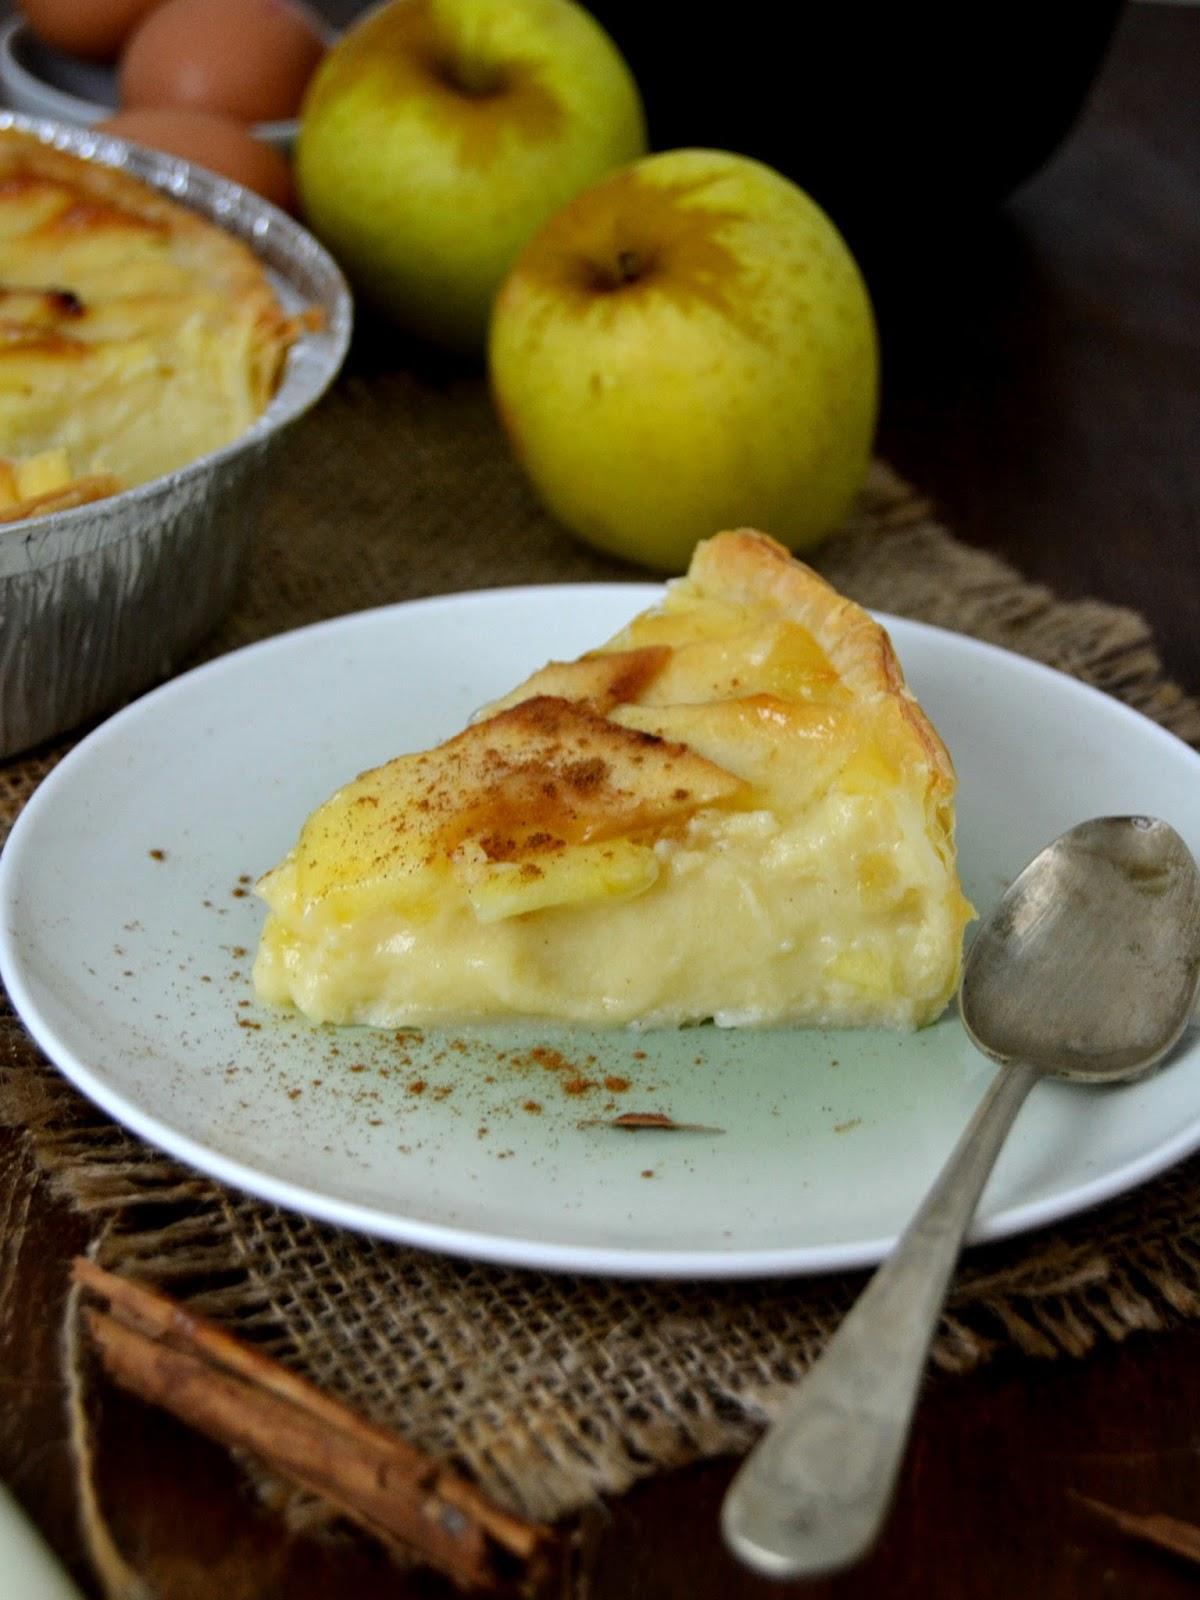 Tarta de manzana con crema  Cuuking Recetas de cocina